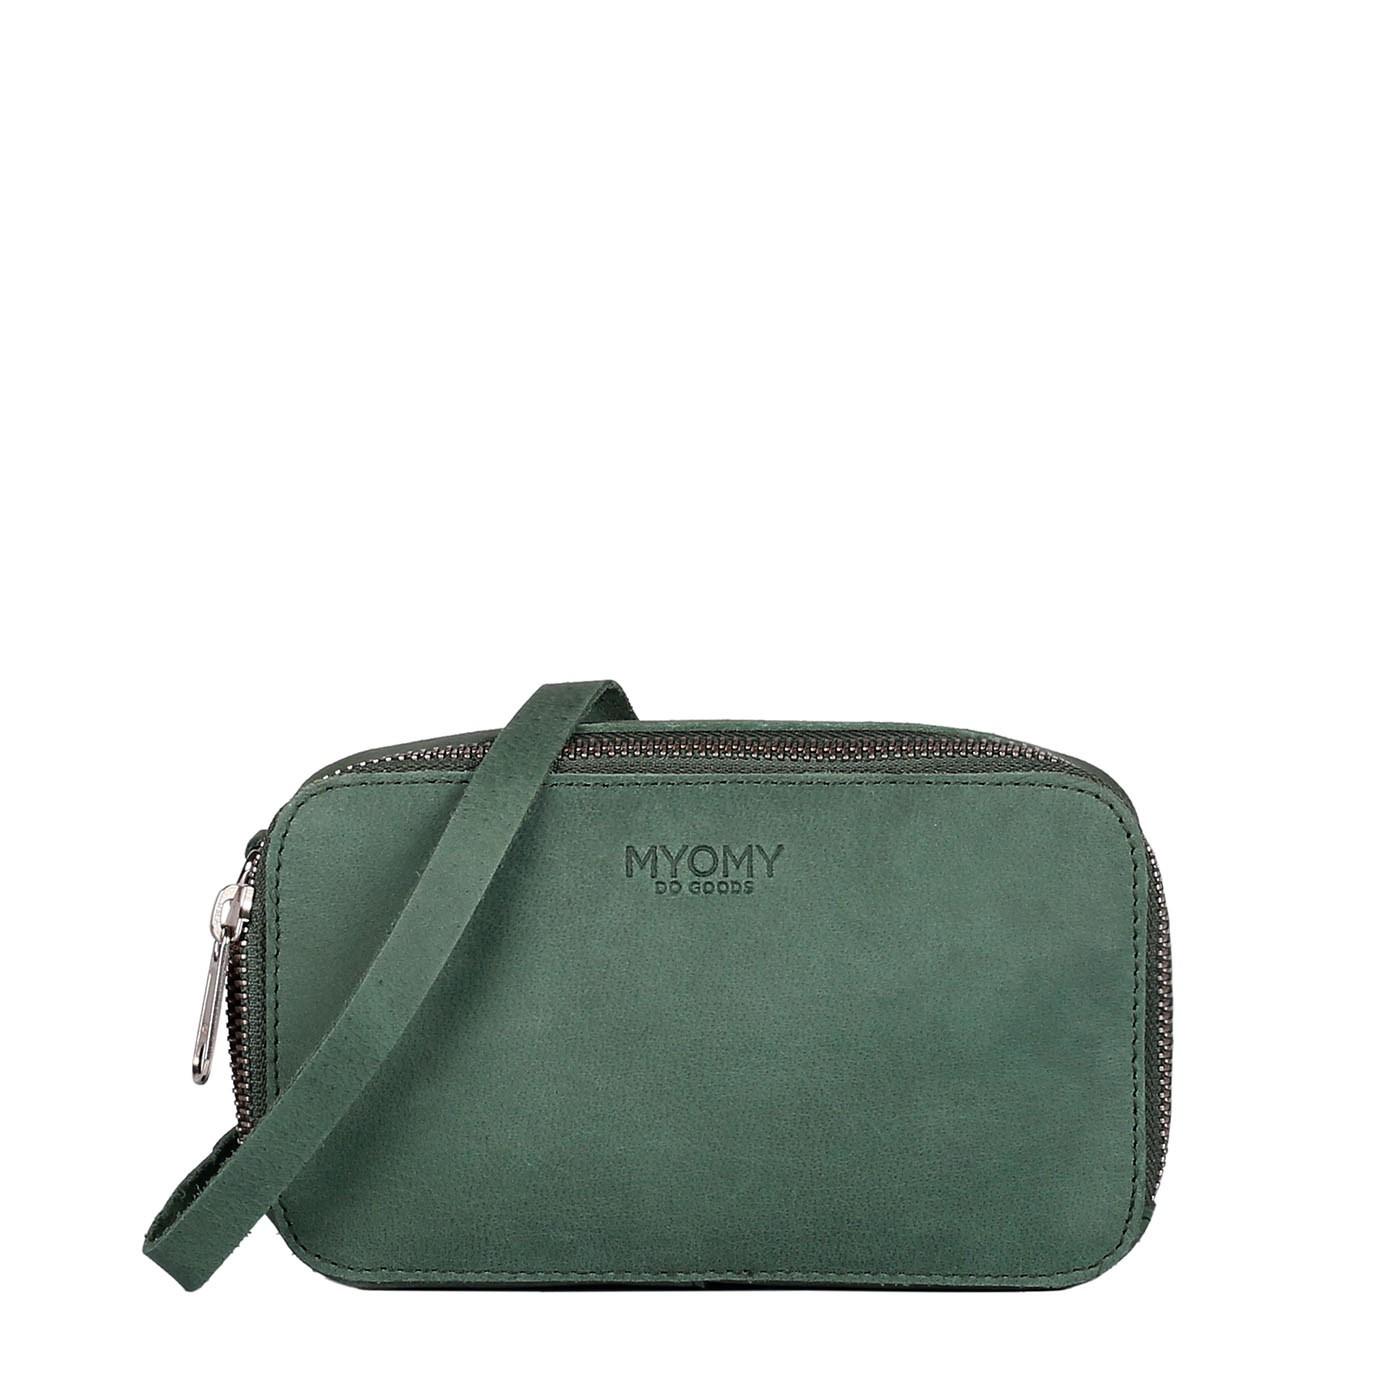 MY BLACK BAG Boxy - hunter forest green